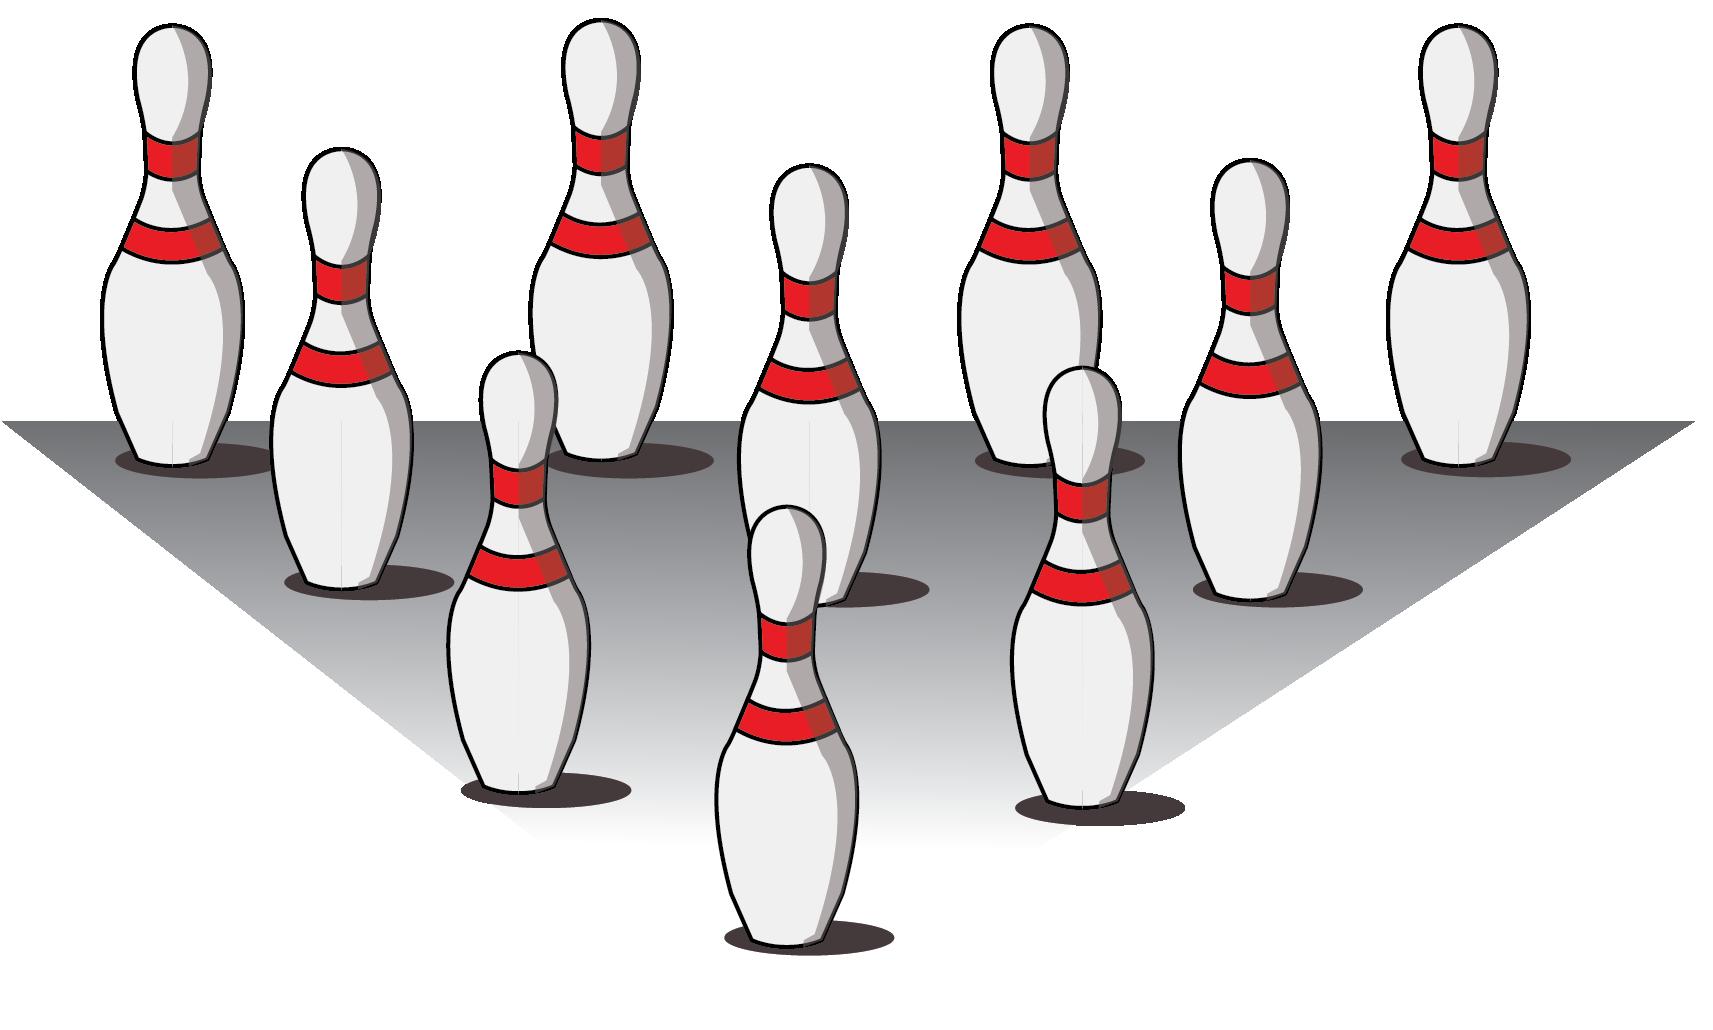 Bowling Pins: Arithmetic Progression